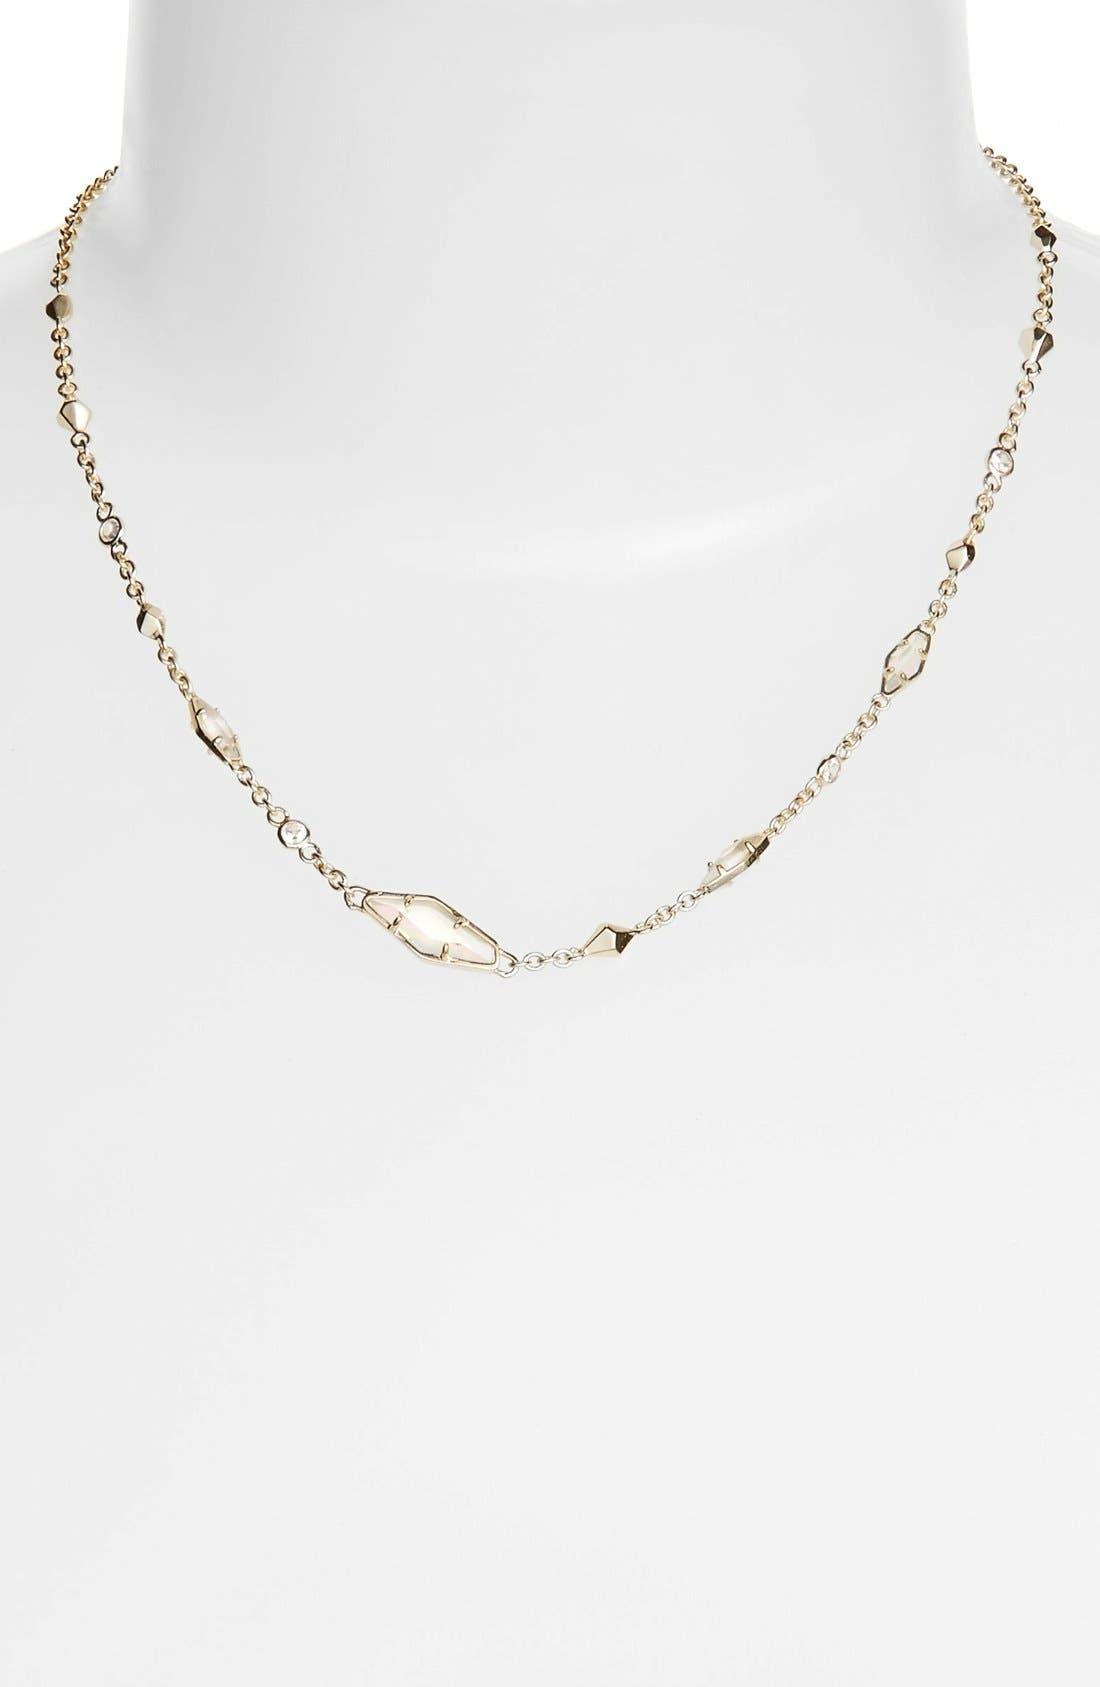 Kendra Scott 'Debra' Jewel Necklace